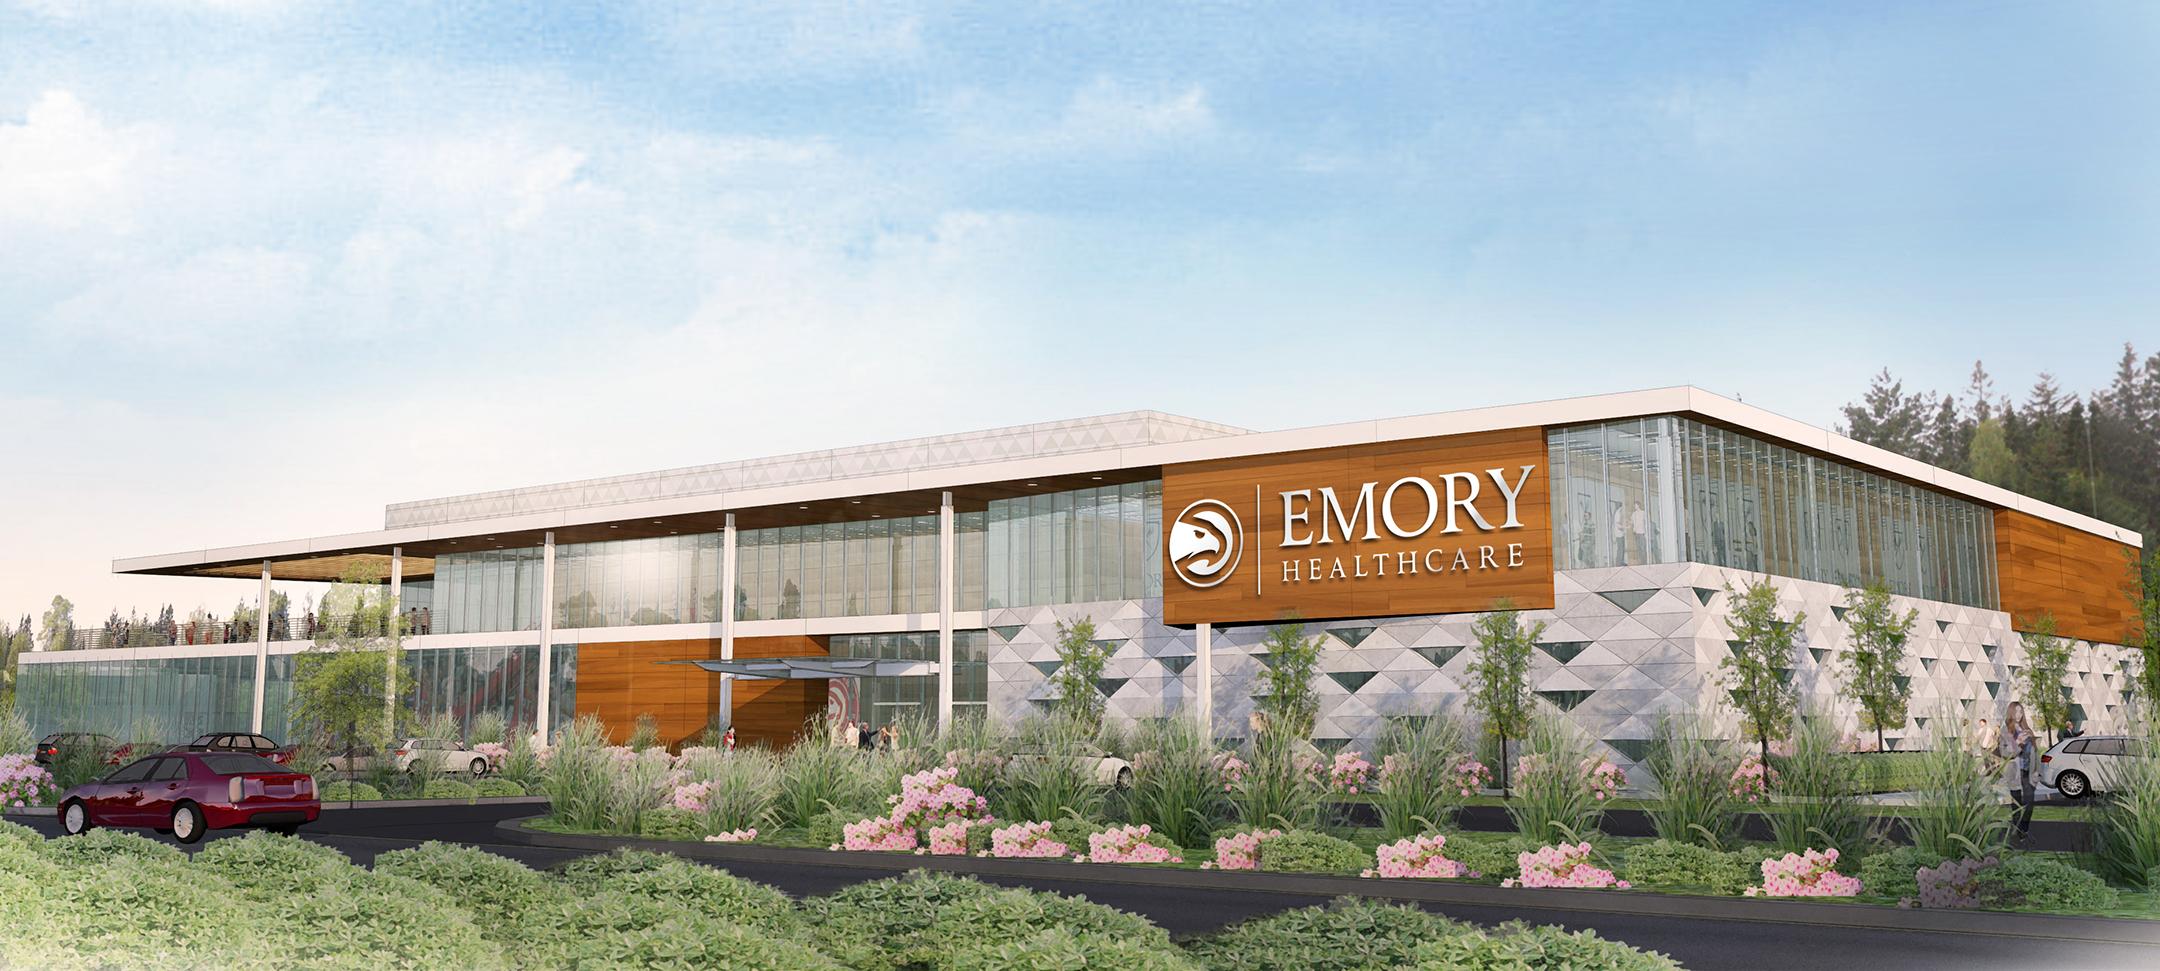 Emory, Atlanta Hawks Announce New Joint Sports Medicine Facility